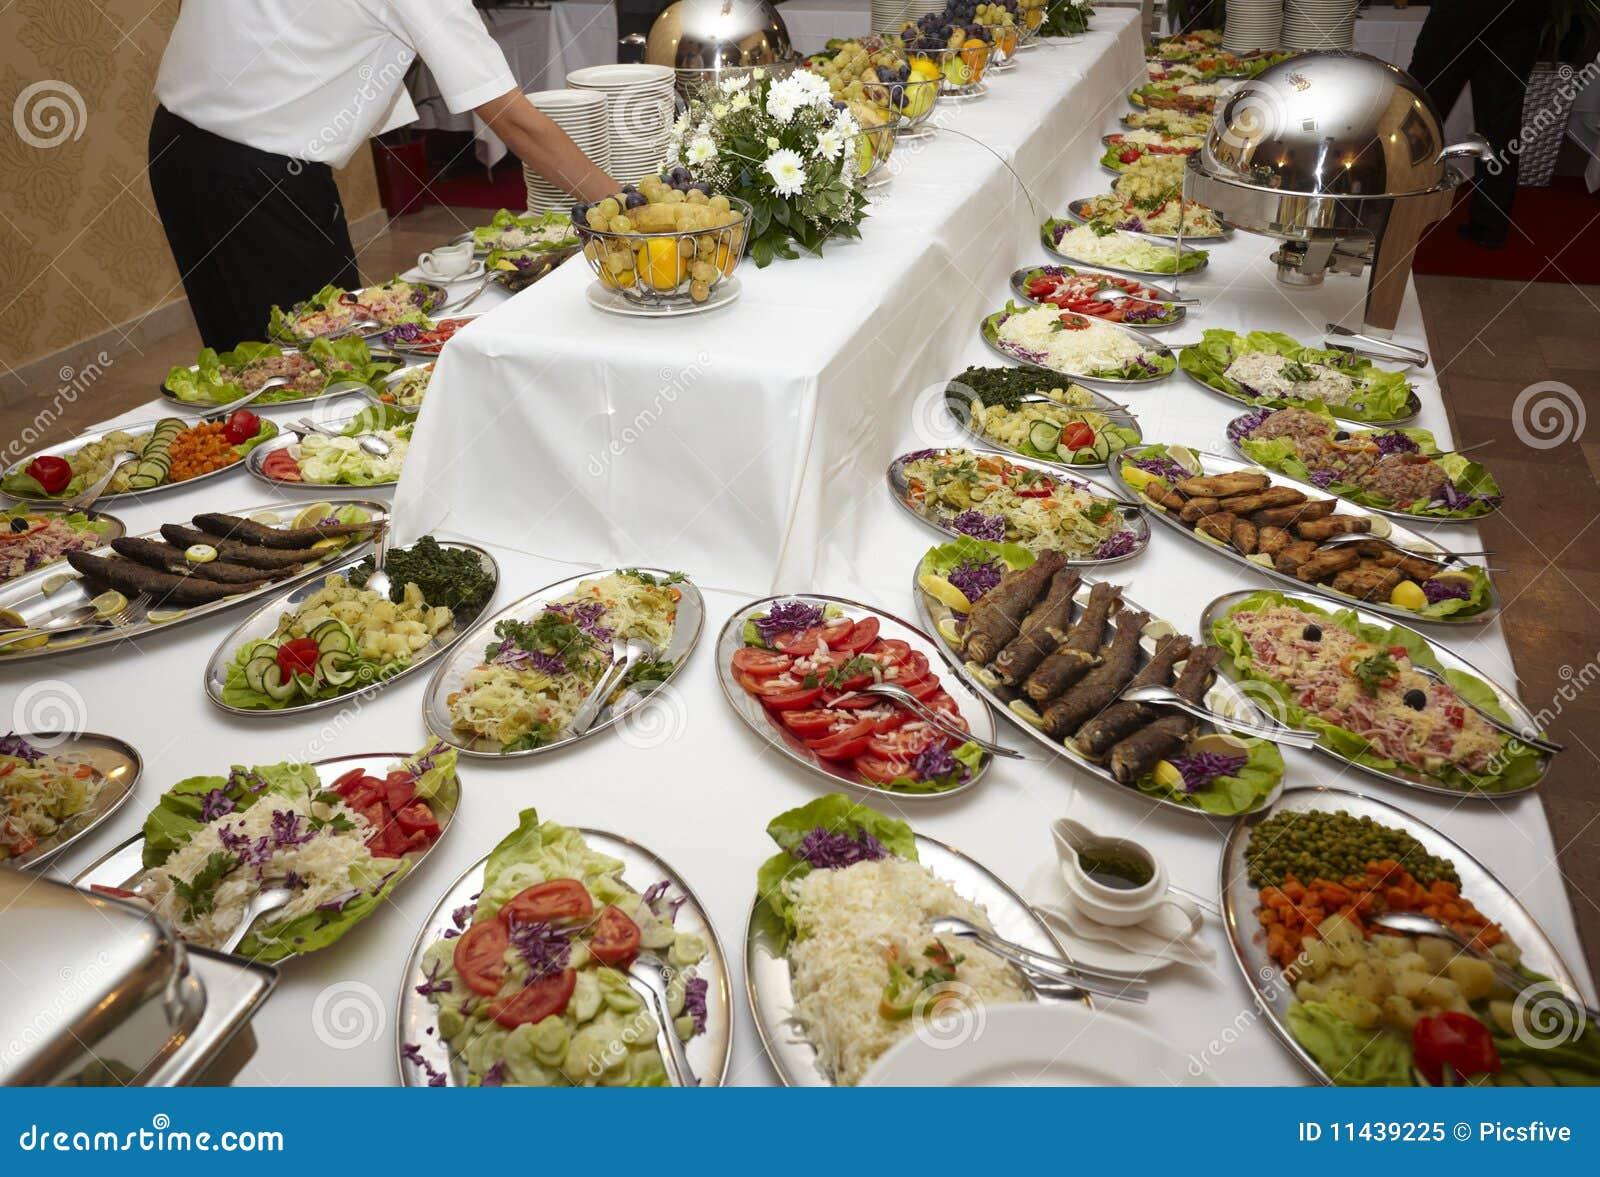 Catering food restaurant cuisine royalty free stock photo for Restaurant cuisine